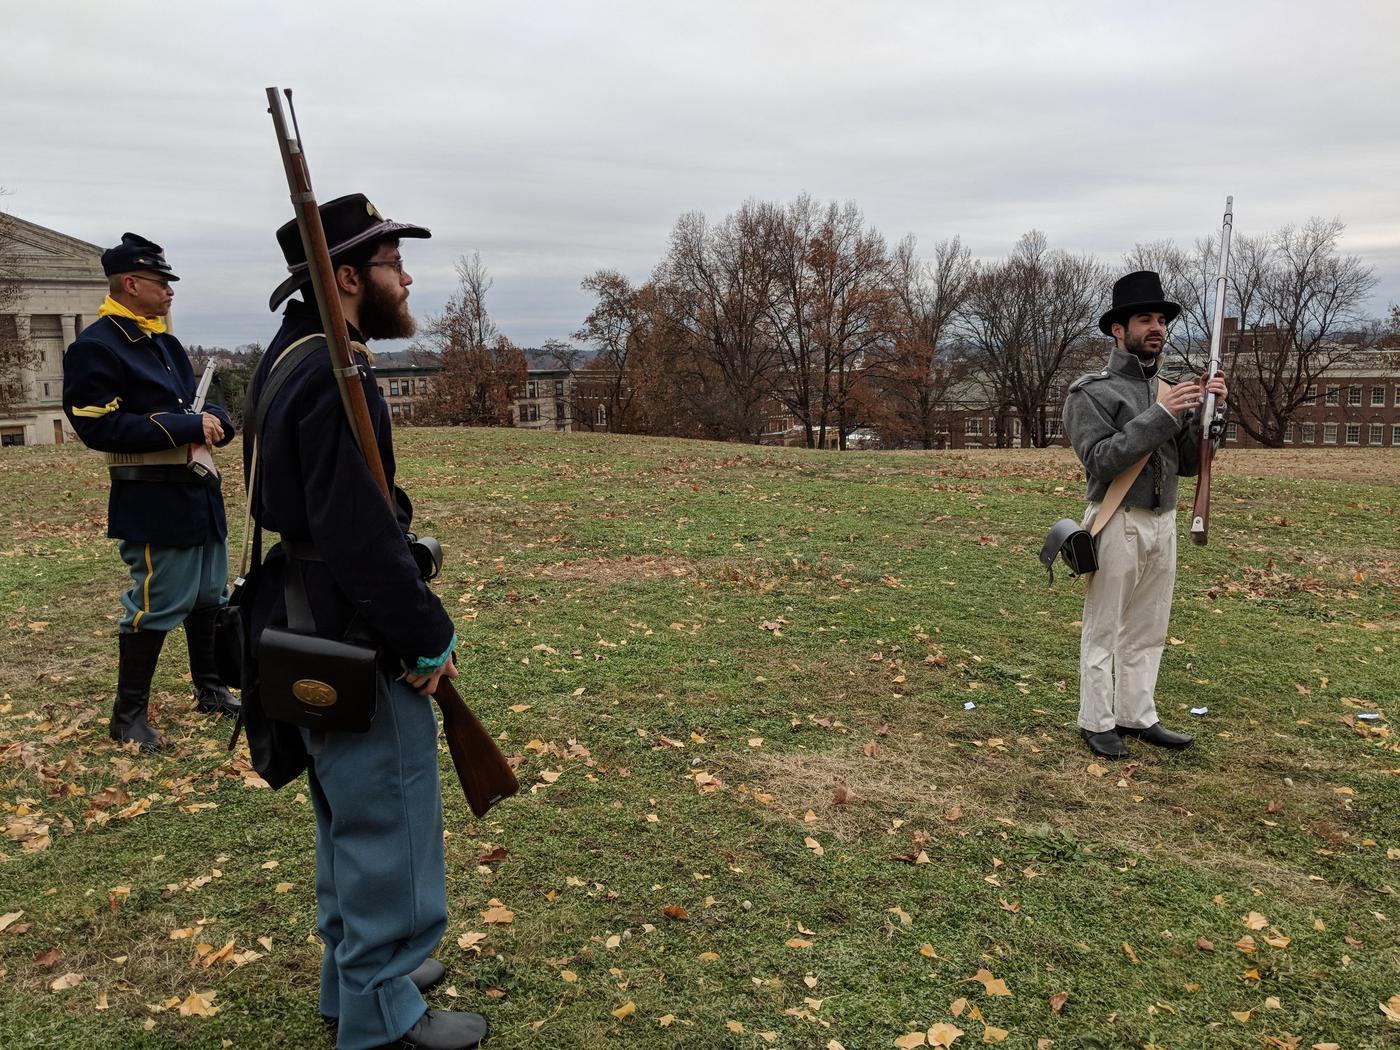 Blank Firing DemostrationPark Volunteers give a blank firing demonstration of historic firearms.